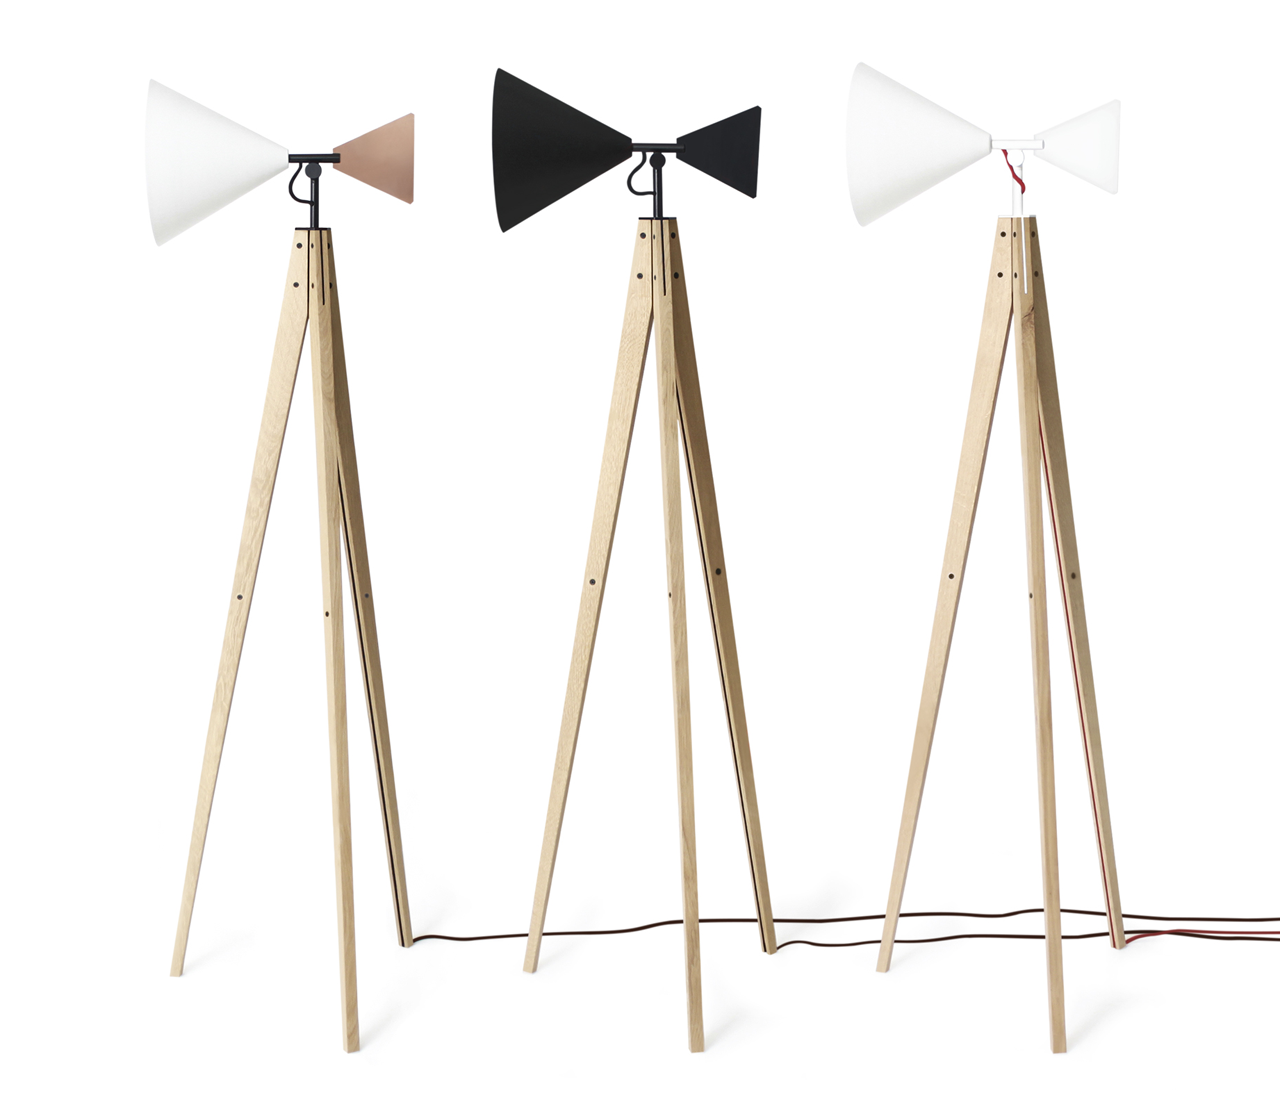 Lighttale Floor Lamp By 201 Design Studio For Ubikubi Sohomod Blog